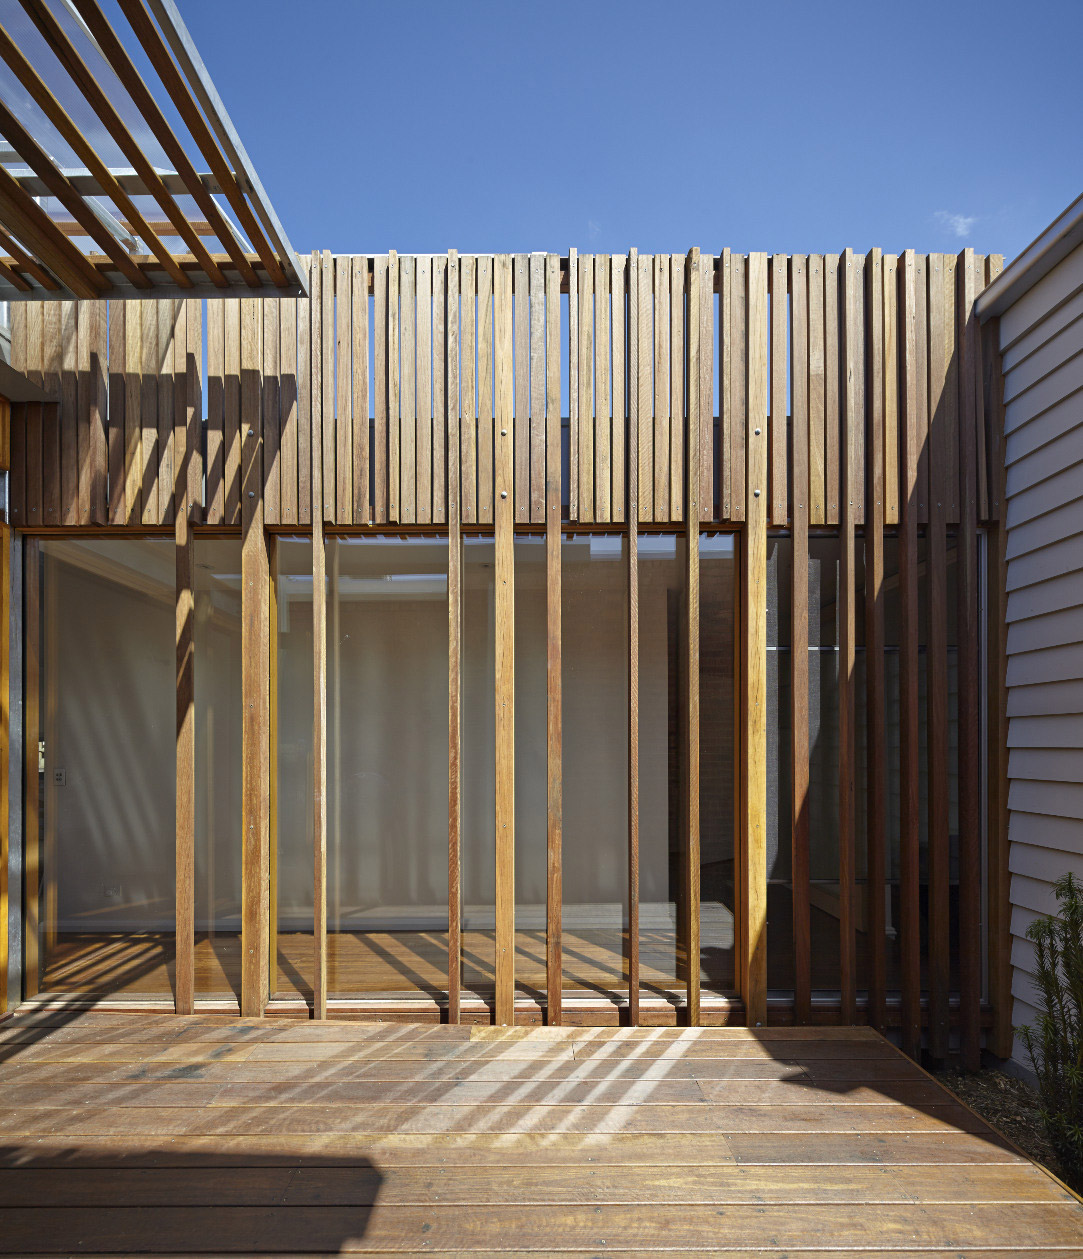 convertible-courtyards-house-christopher-megowan-design-5